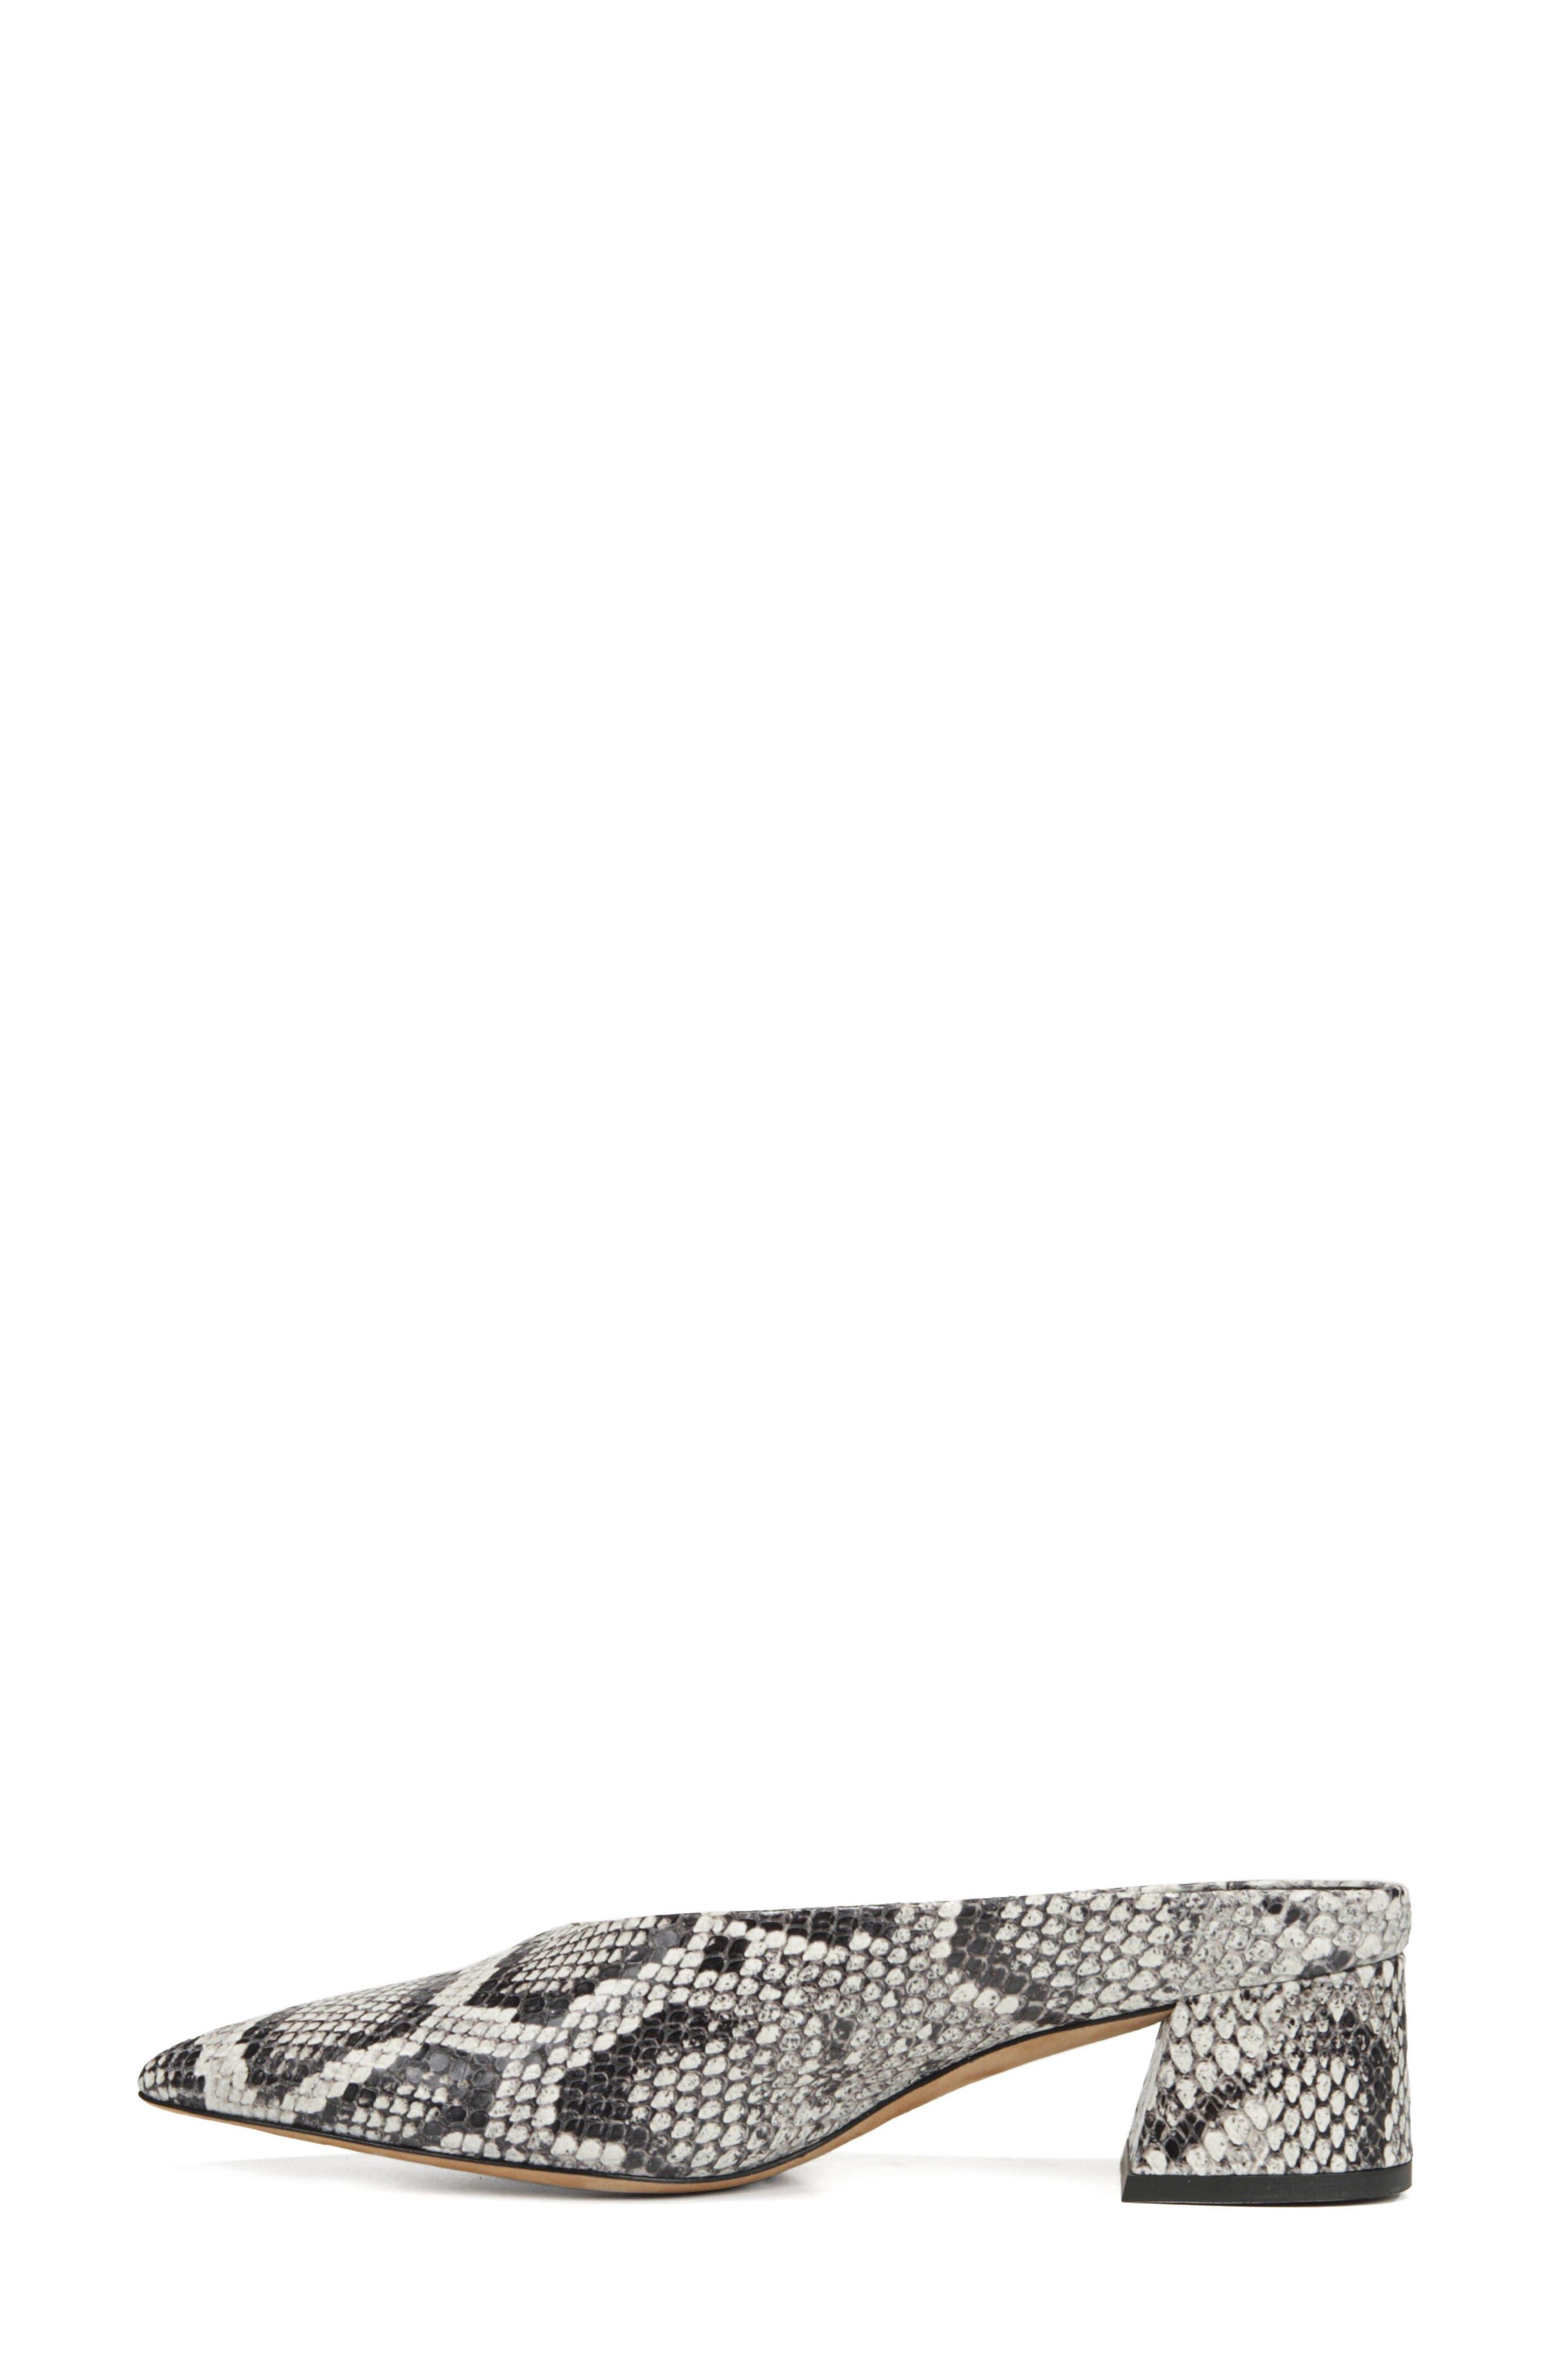 VINCE, Ralston Pointy Toe Mule, Alternate thumbnail 8, color, SAHARA SNAKE PRINT